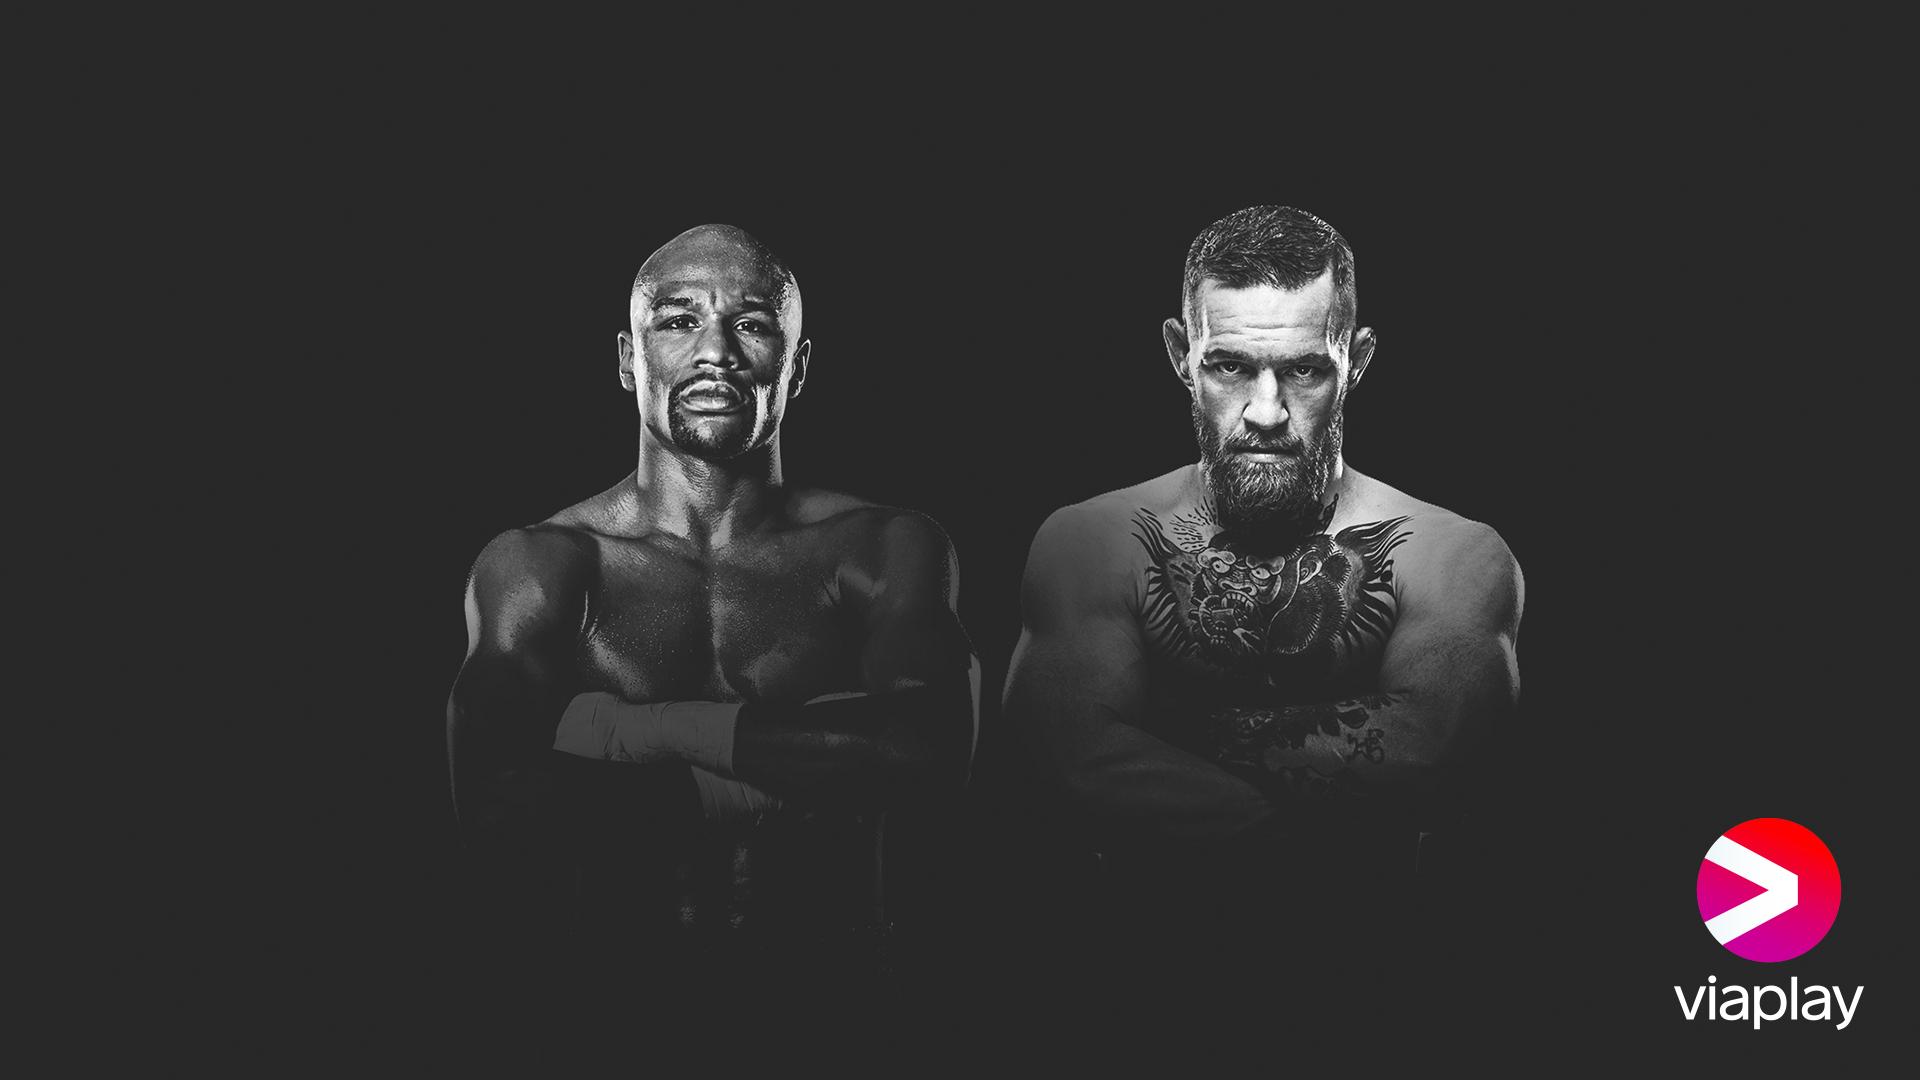 Watch Floyd Mayweather vs Conor McGregor Live on Viaplay